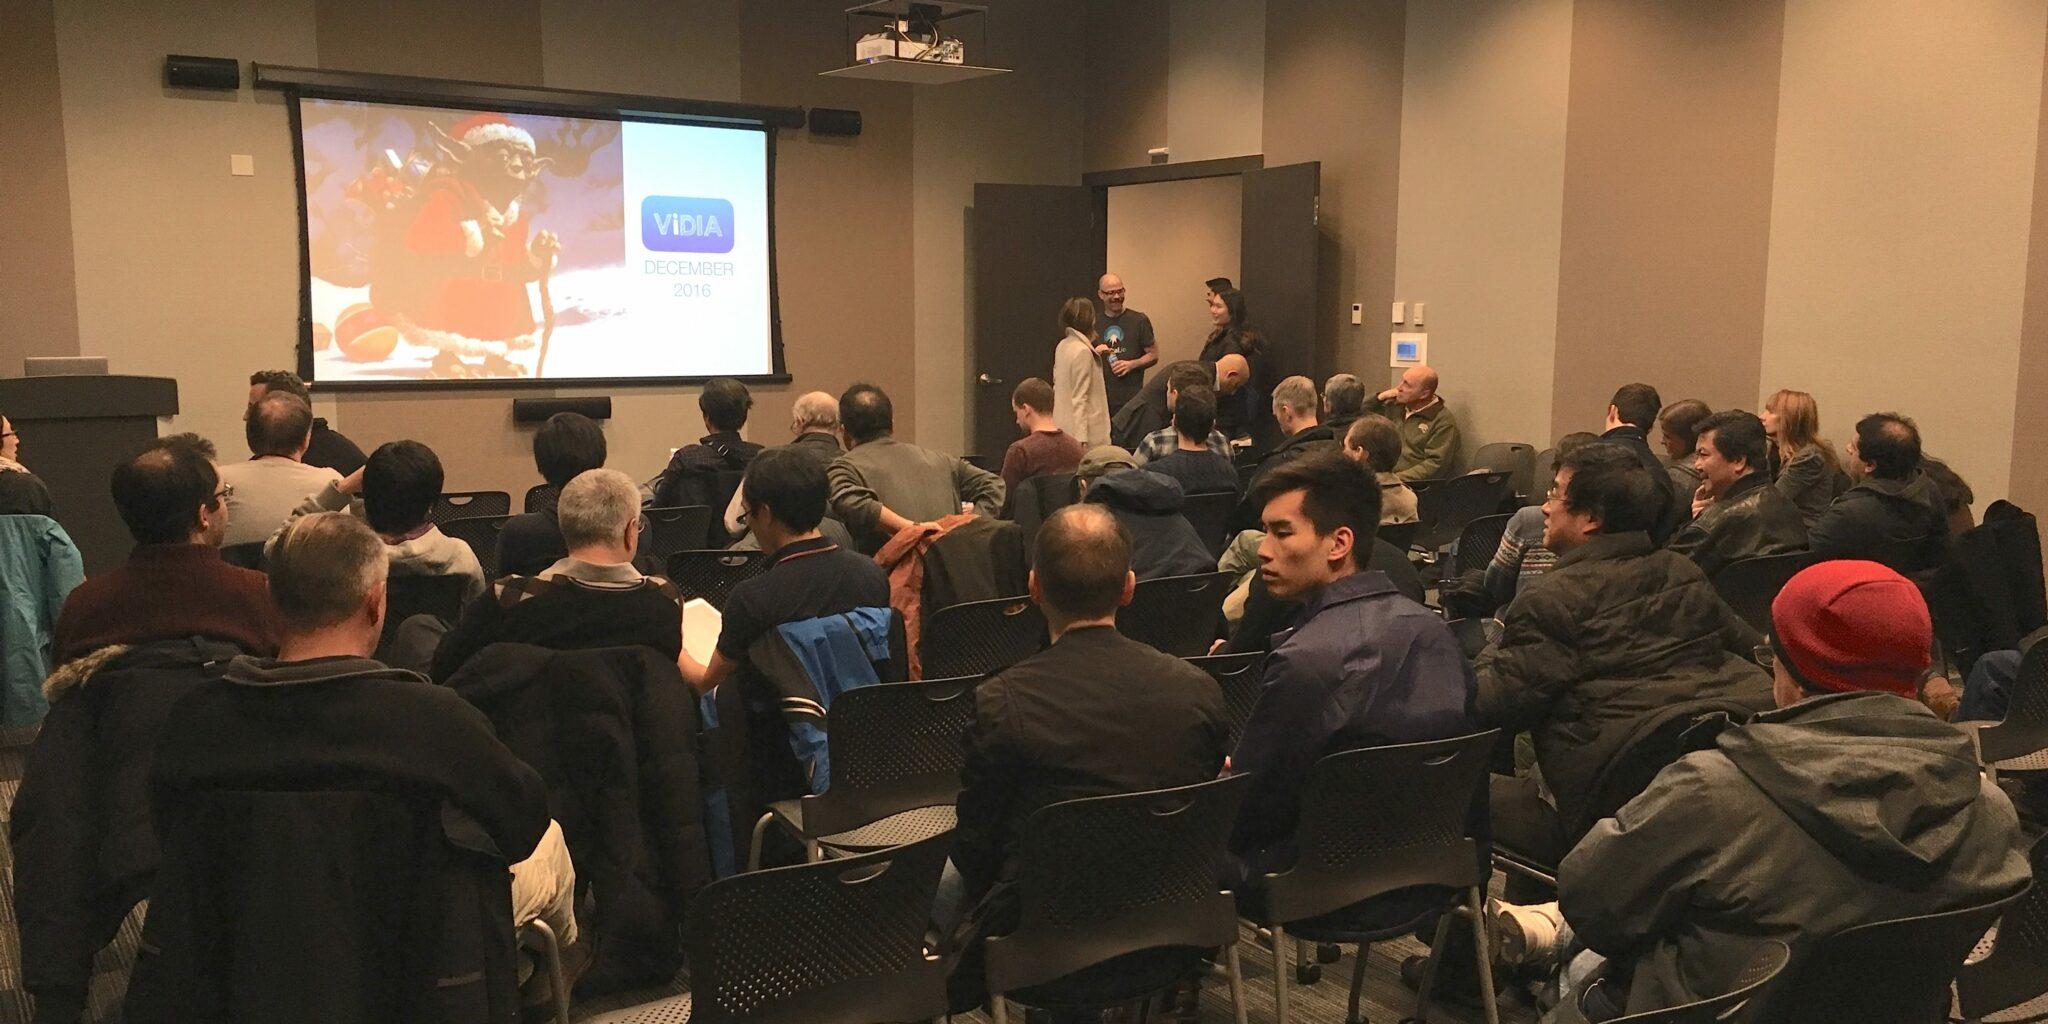 ViDIA's Last Meetup of the Year!